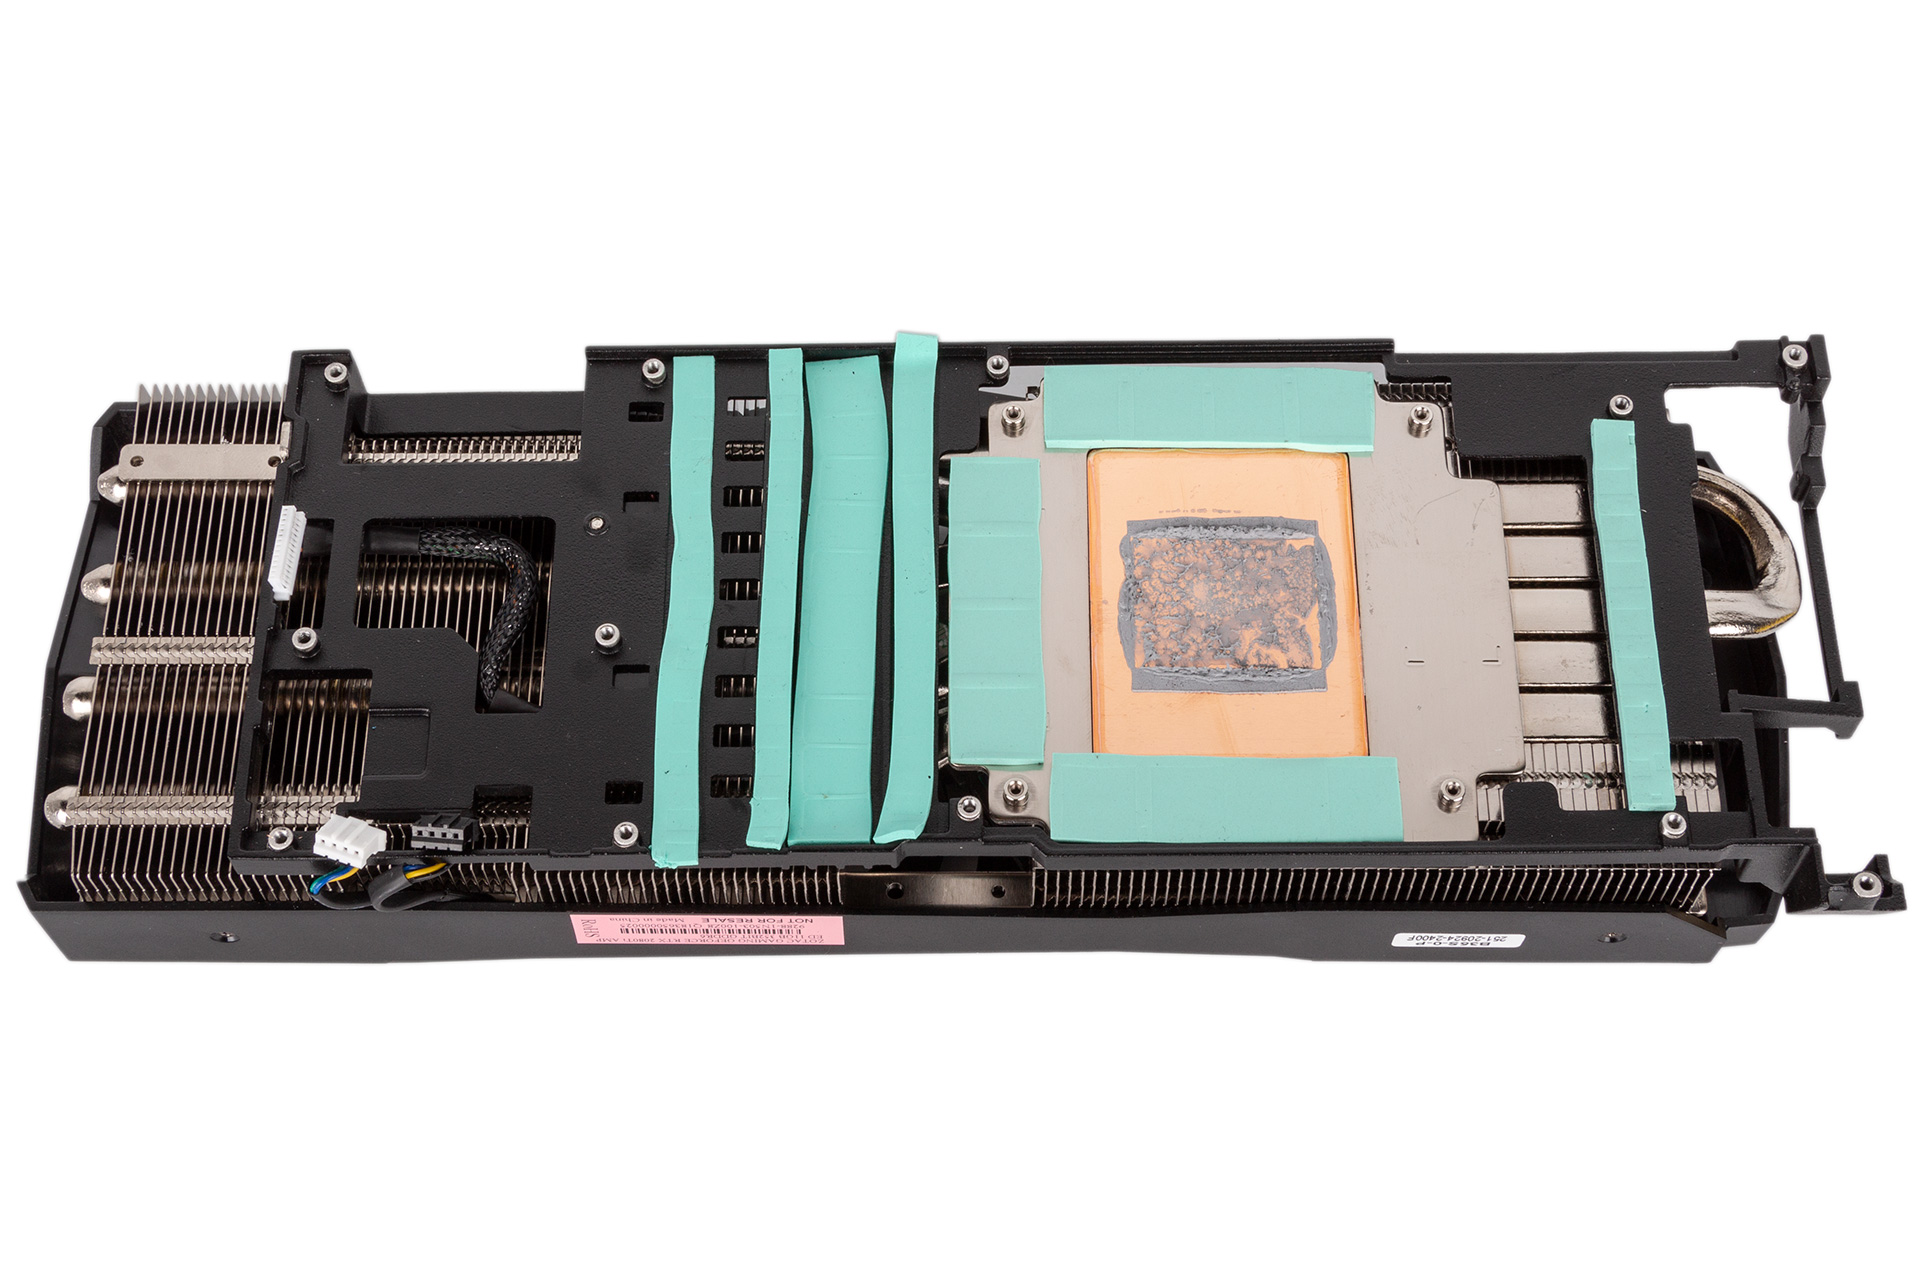 Zotac Gaming GeForce RTX 2080 Ti Amp Review | bit-tech net